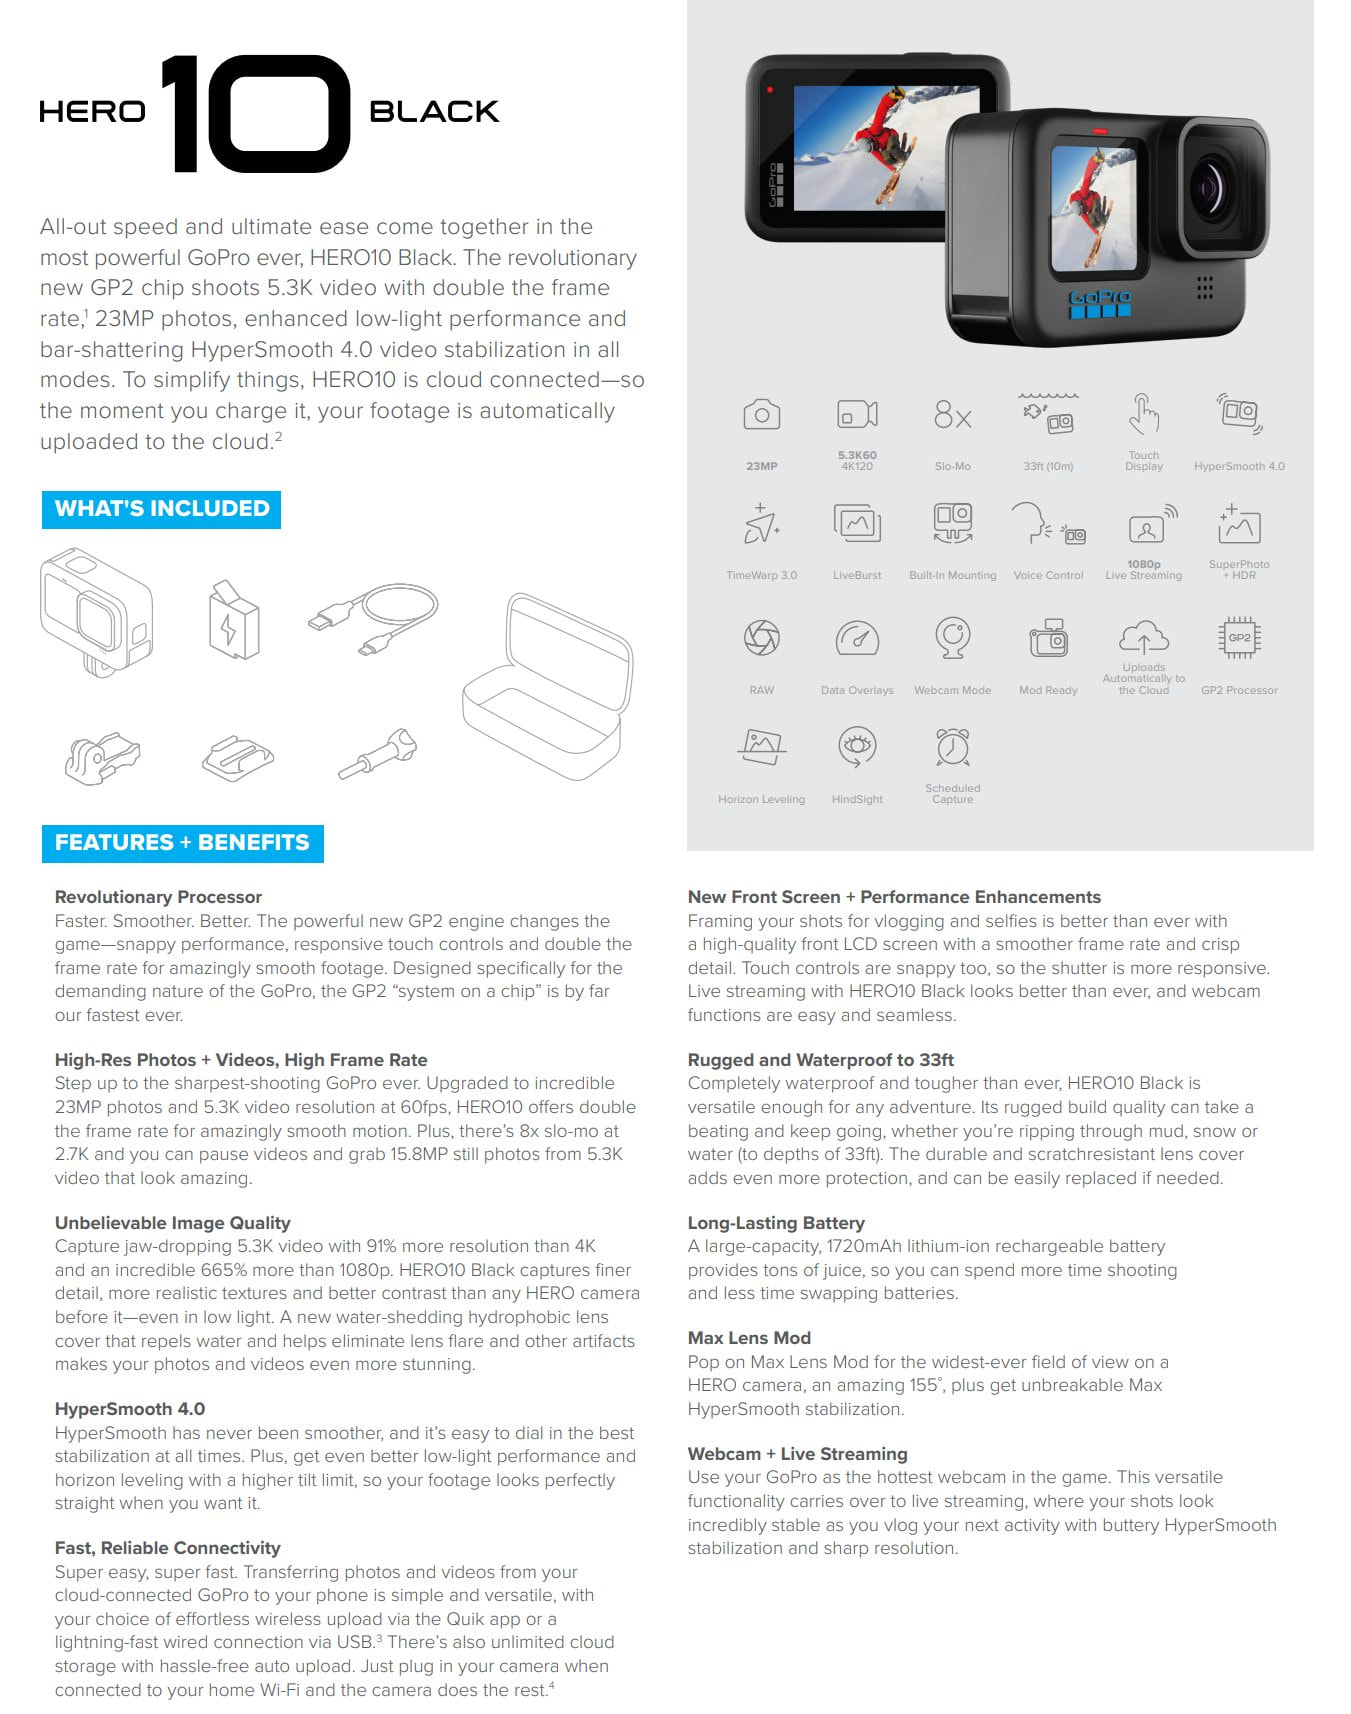 GoPro Hero10 Black Specification Sheet